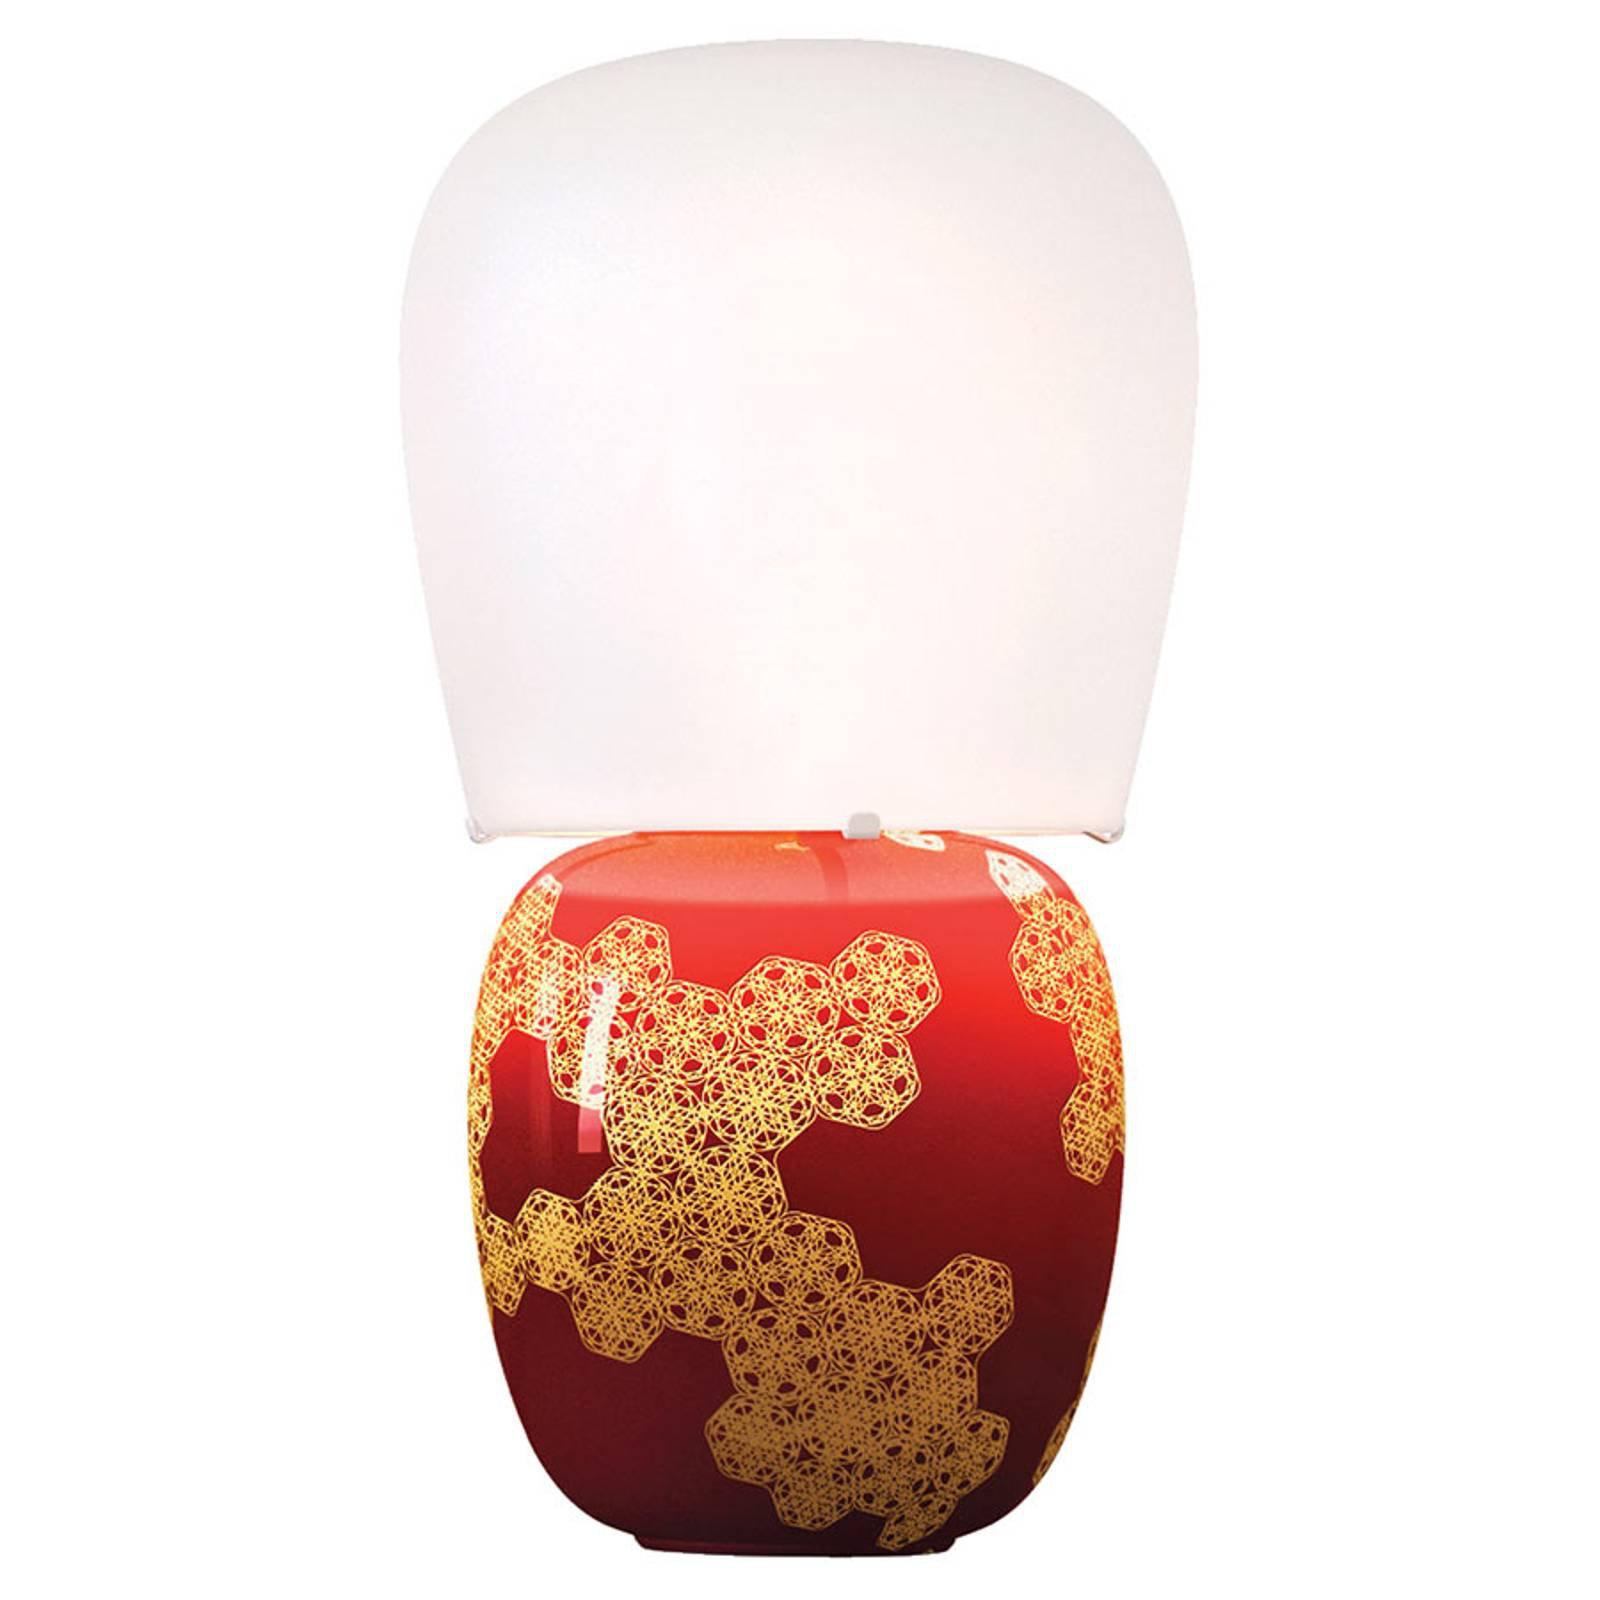 Kundalini Hive - keramisk bordlampe, rød